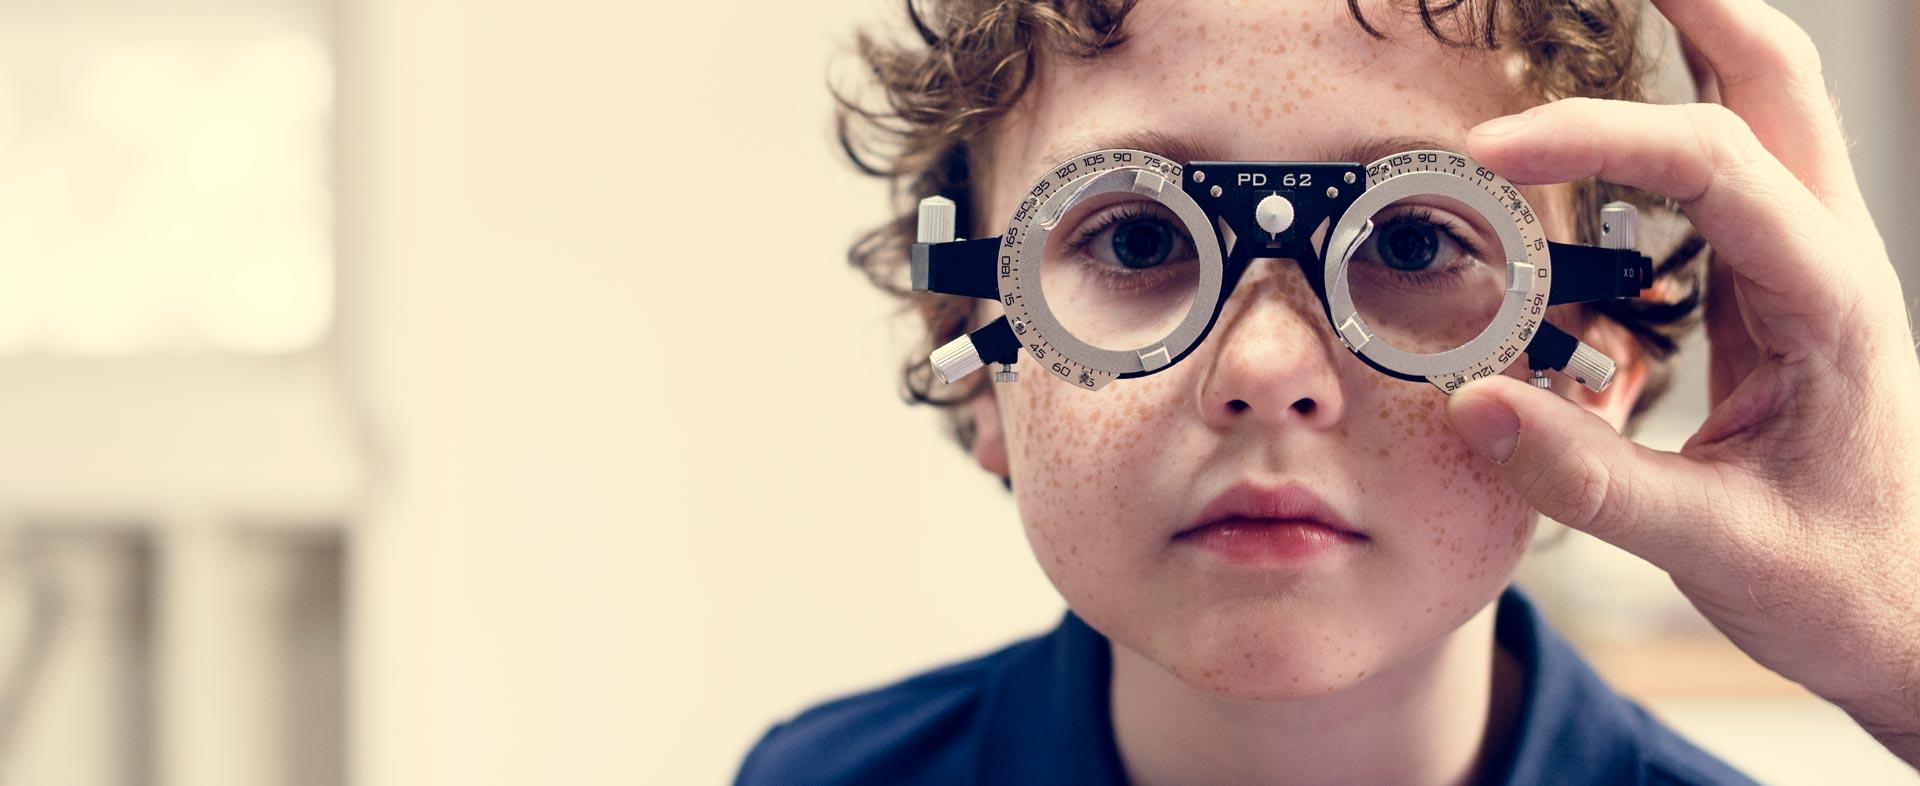 Patologies oculars mes freqüents a la infància